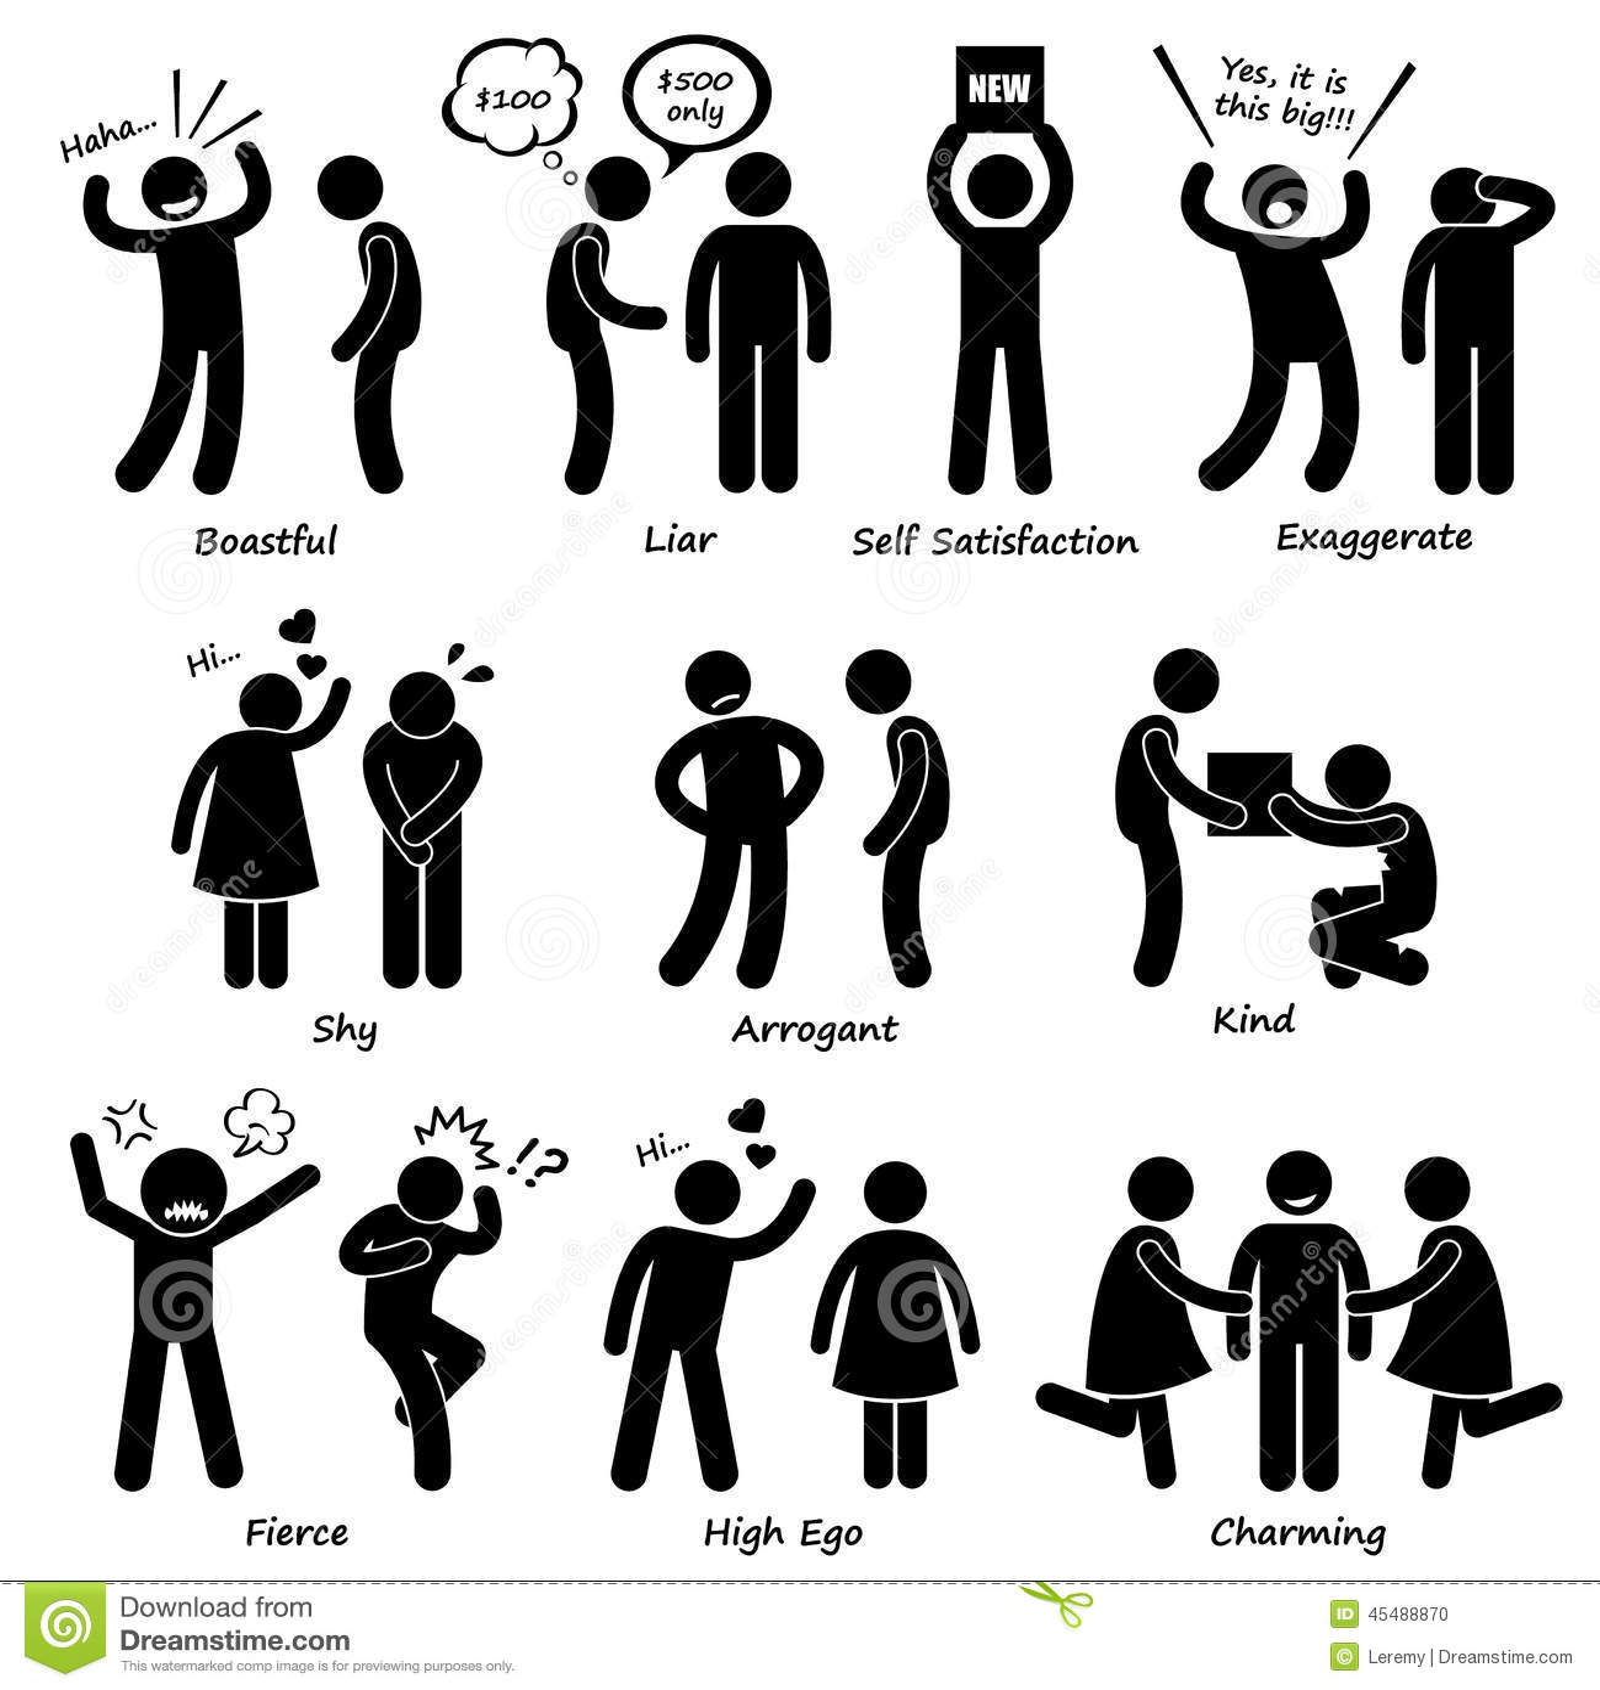 Human Man Character Behaviour Cliparts Icons Stock Vector - Image ...